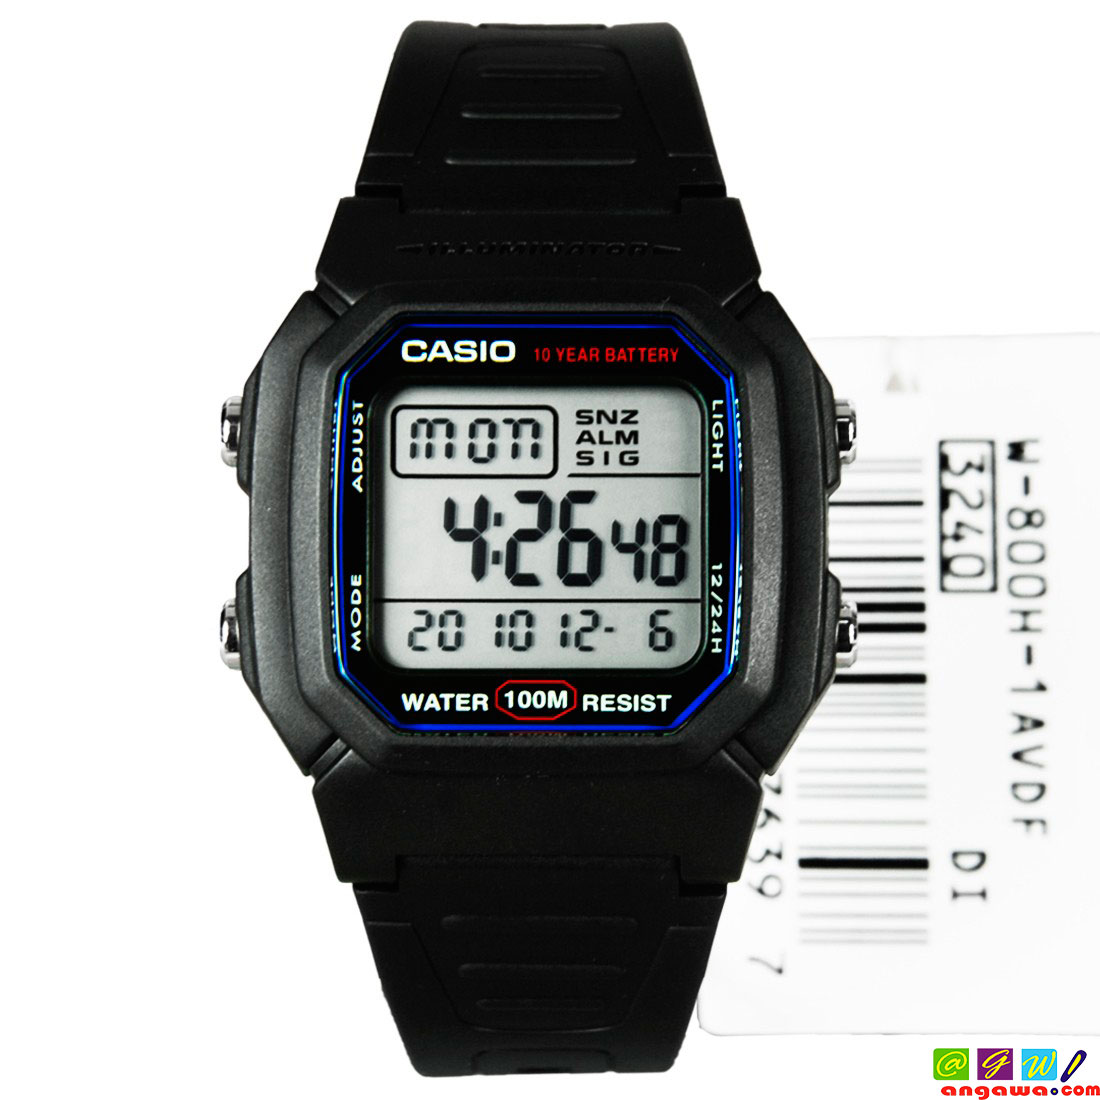 RELOJ CASIO MODELO W-800H-1A